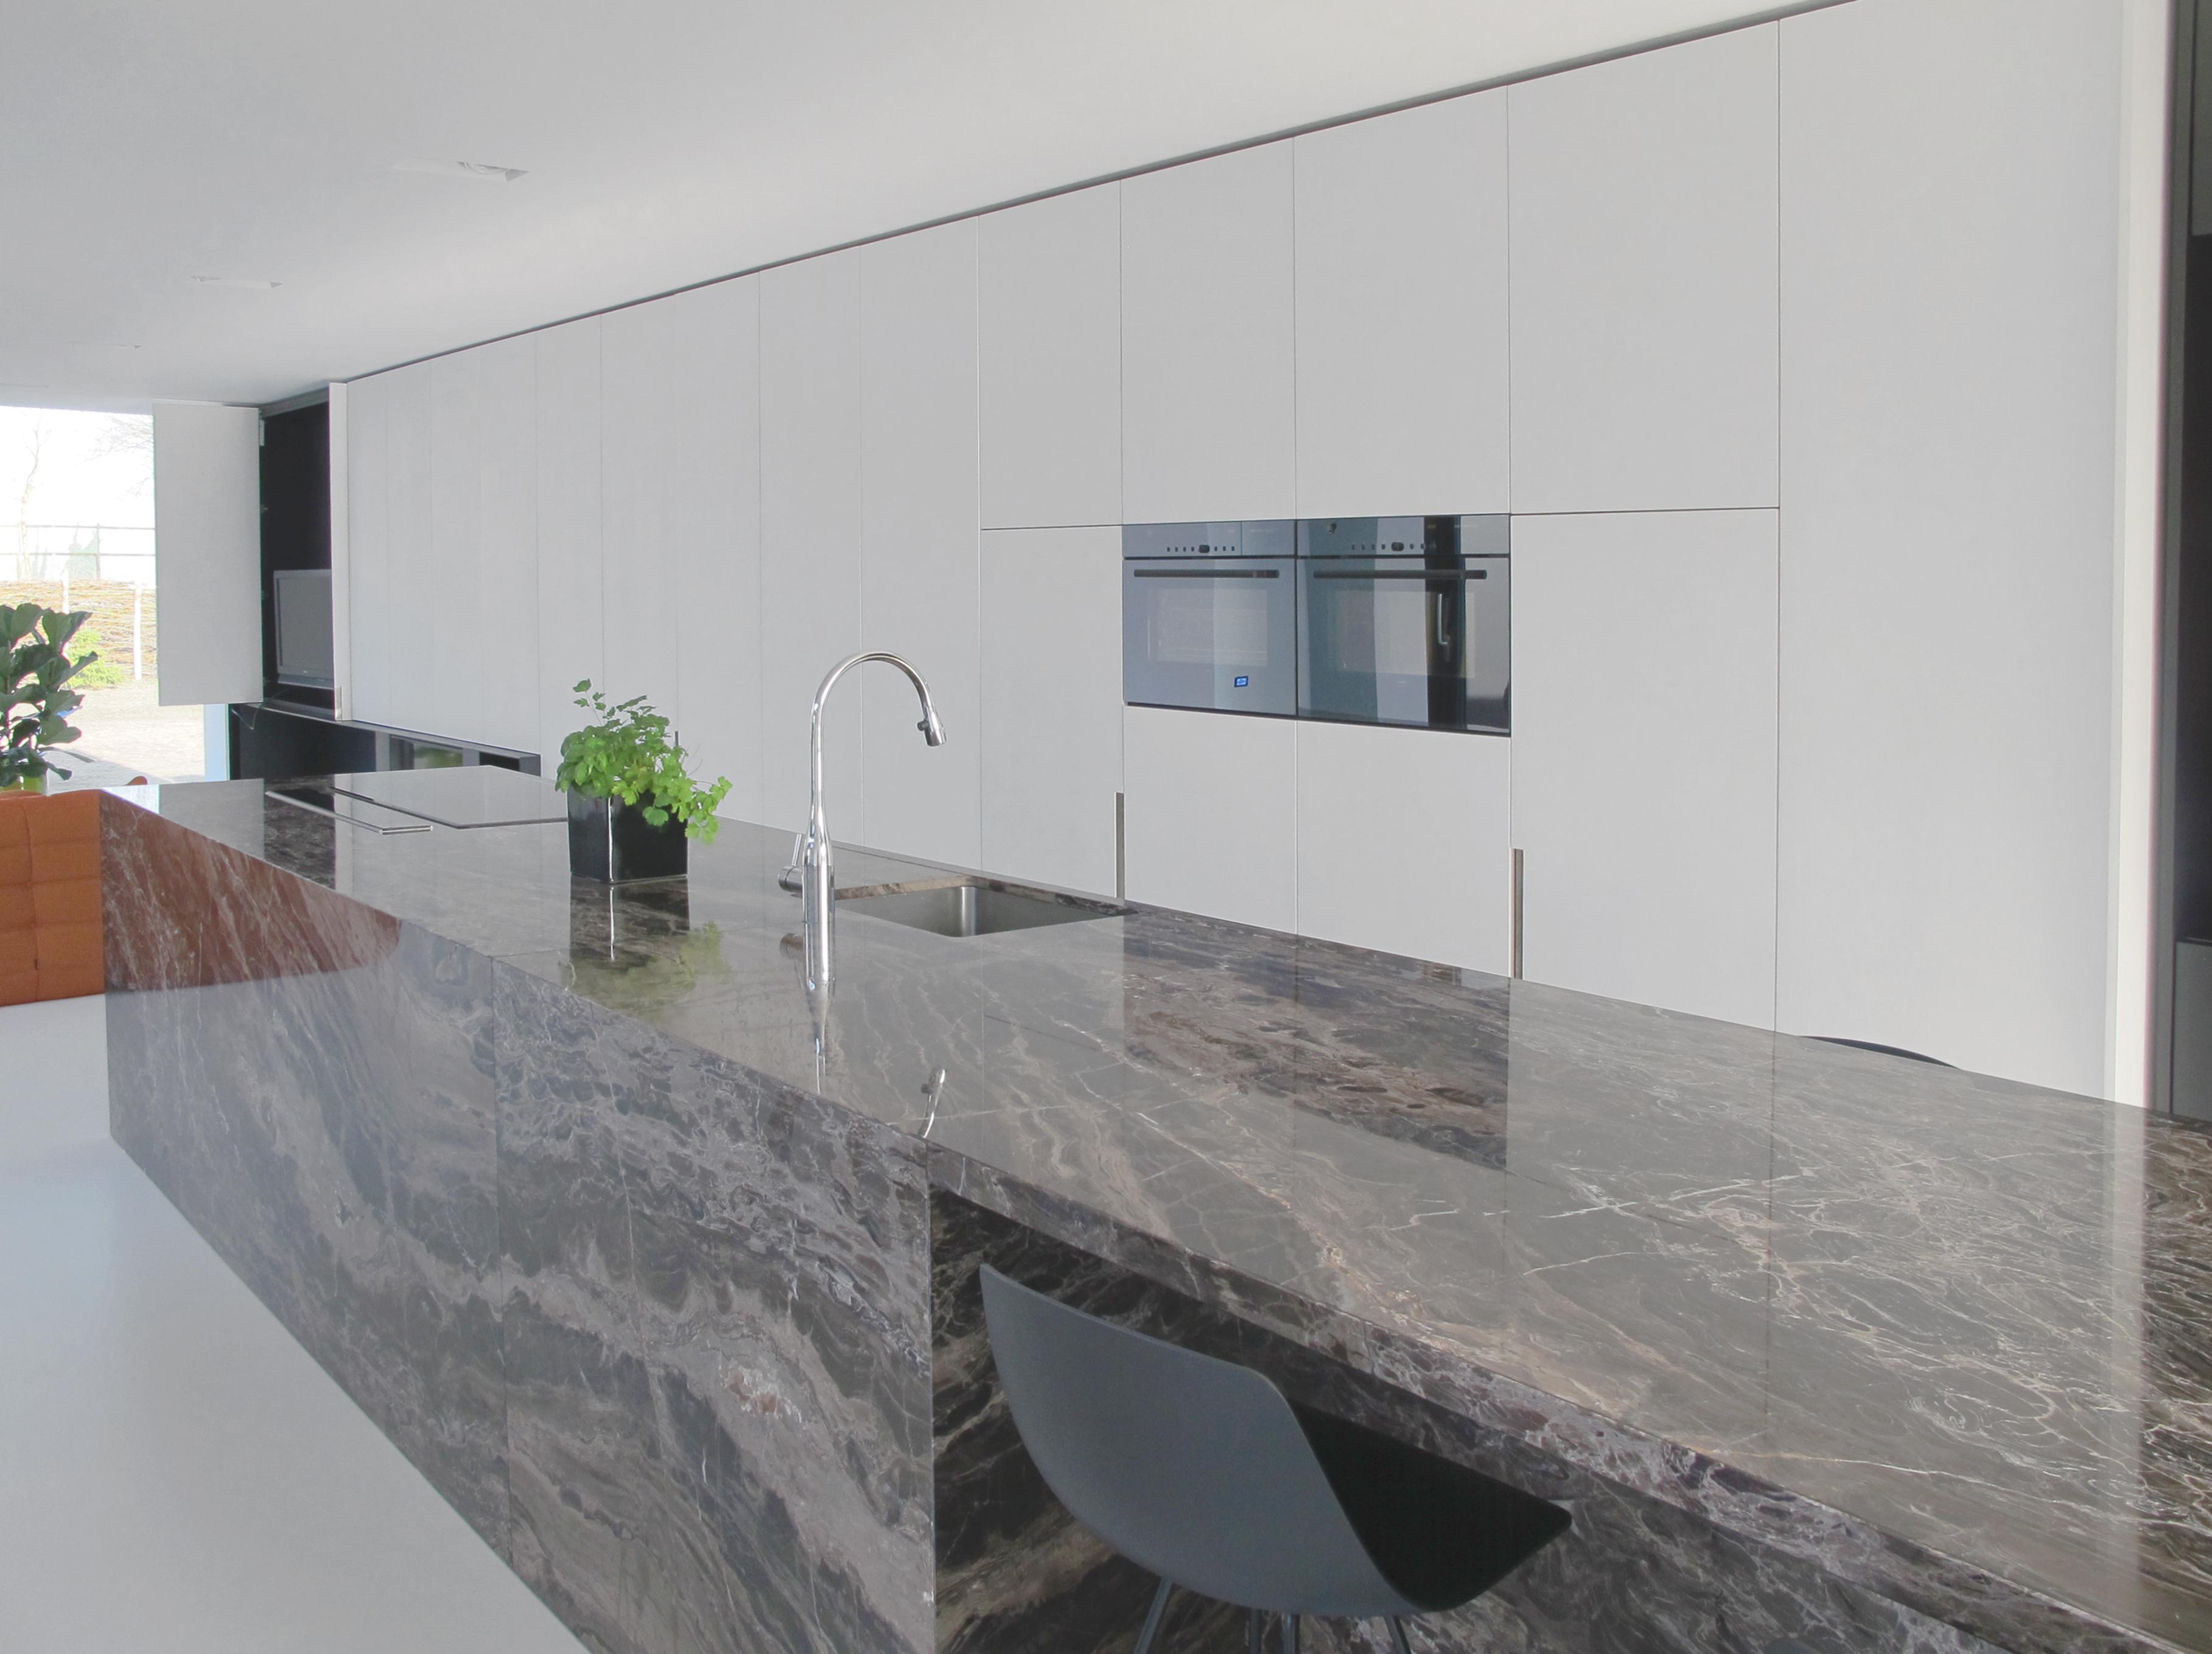 keukeneiland en keukenwand 1